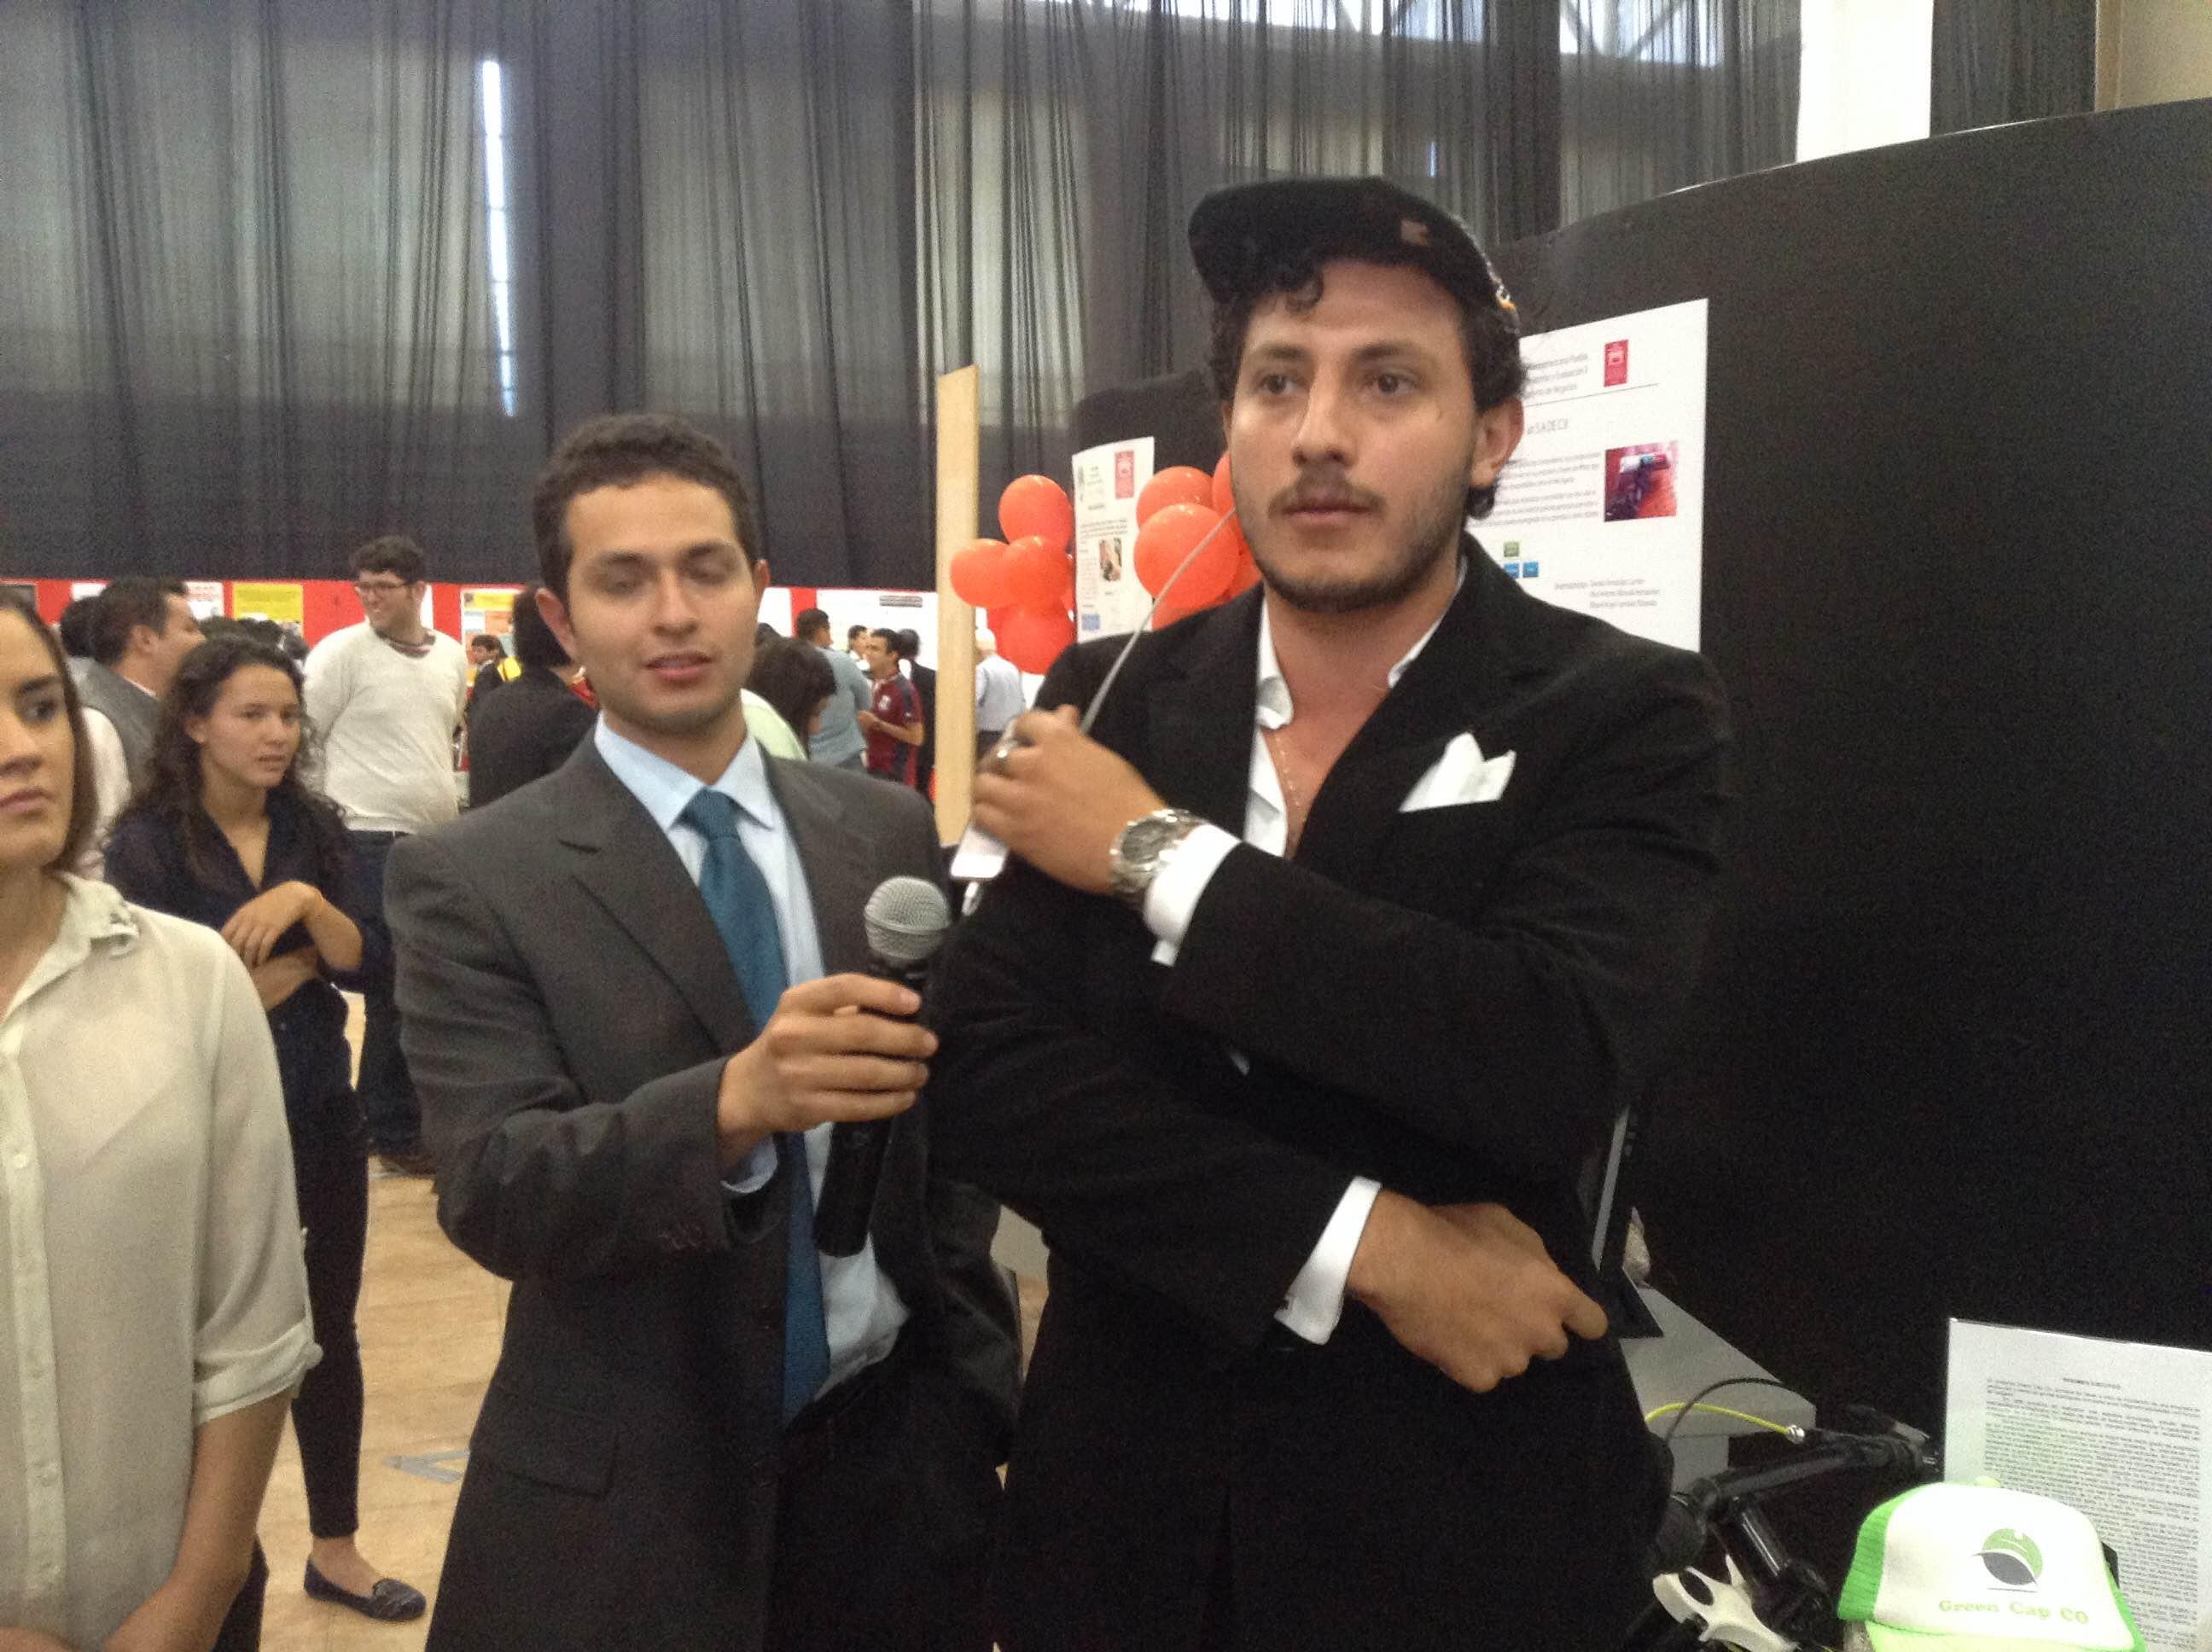 Crean gorra que transforma energía para recargar móviles